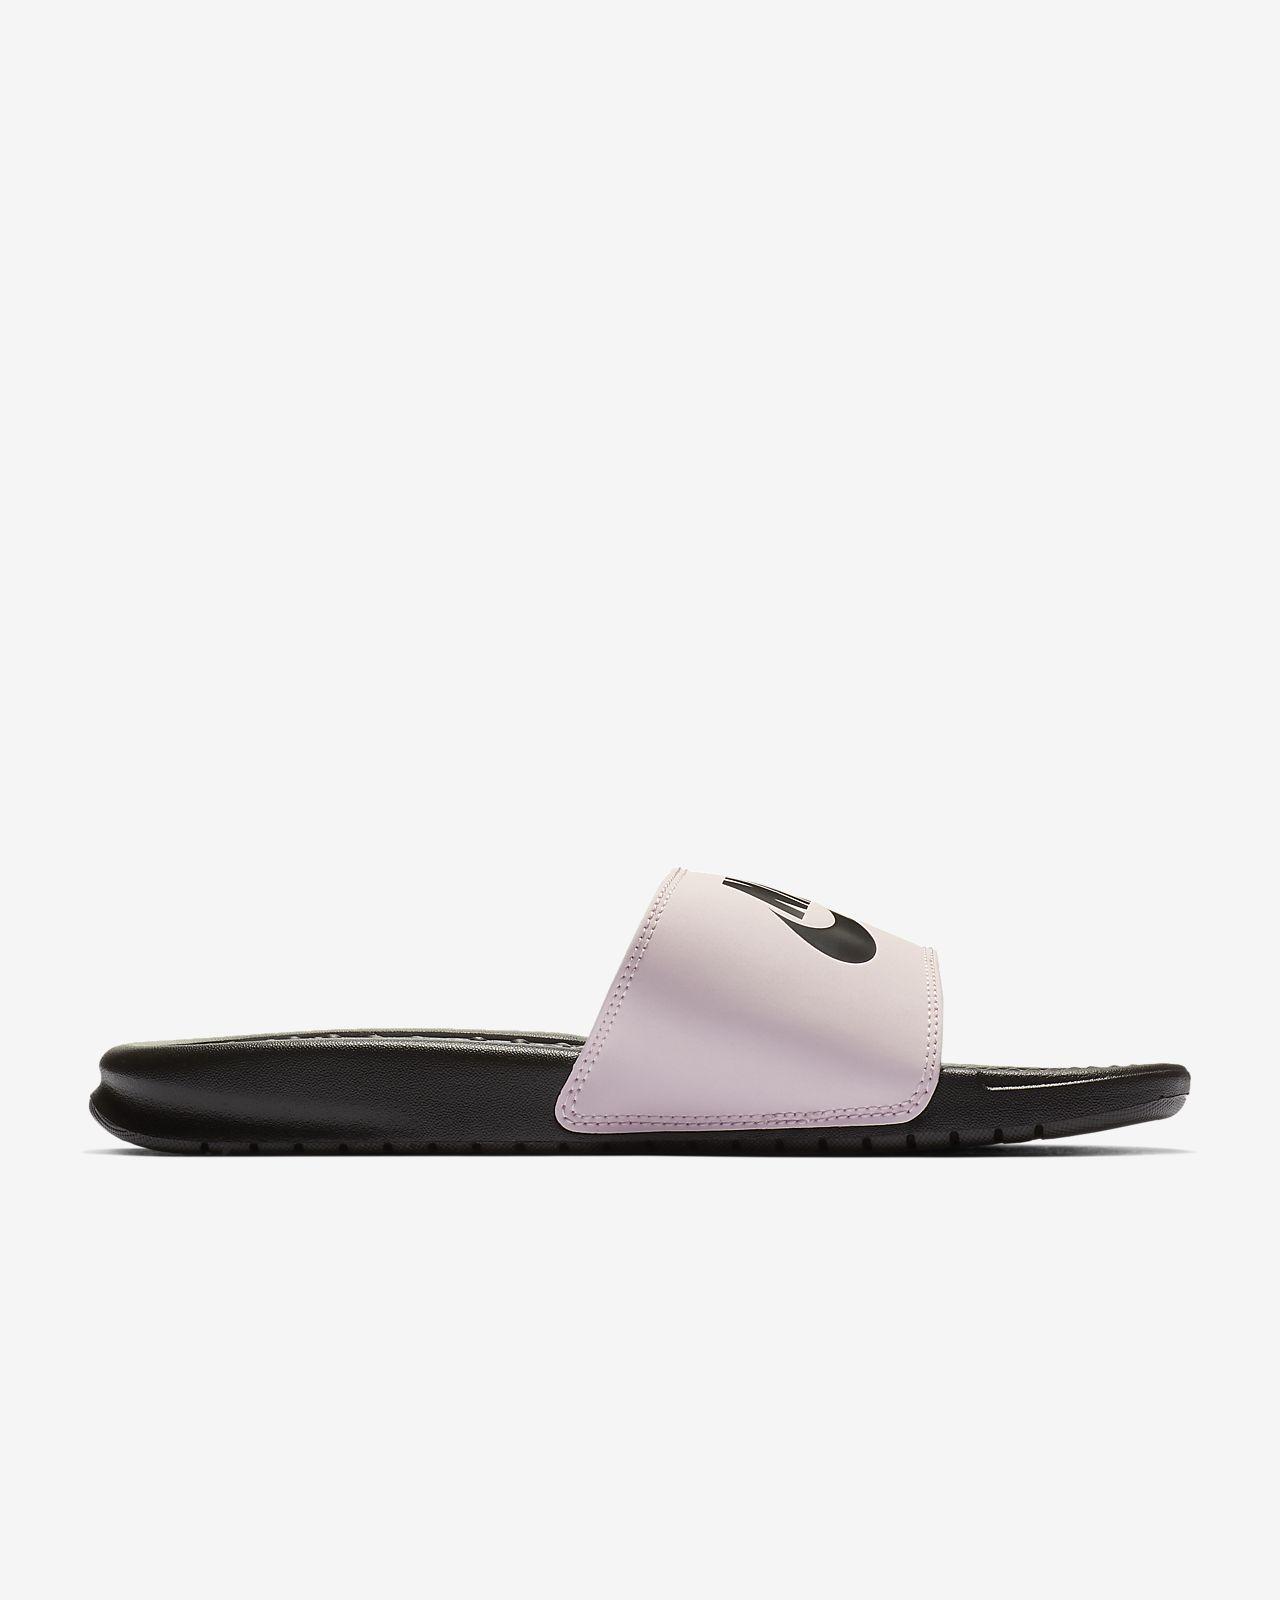 4a8b67a43a99f Low Resolution Nike Benassi Slide Nike Benassi Slide